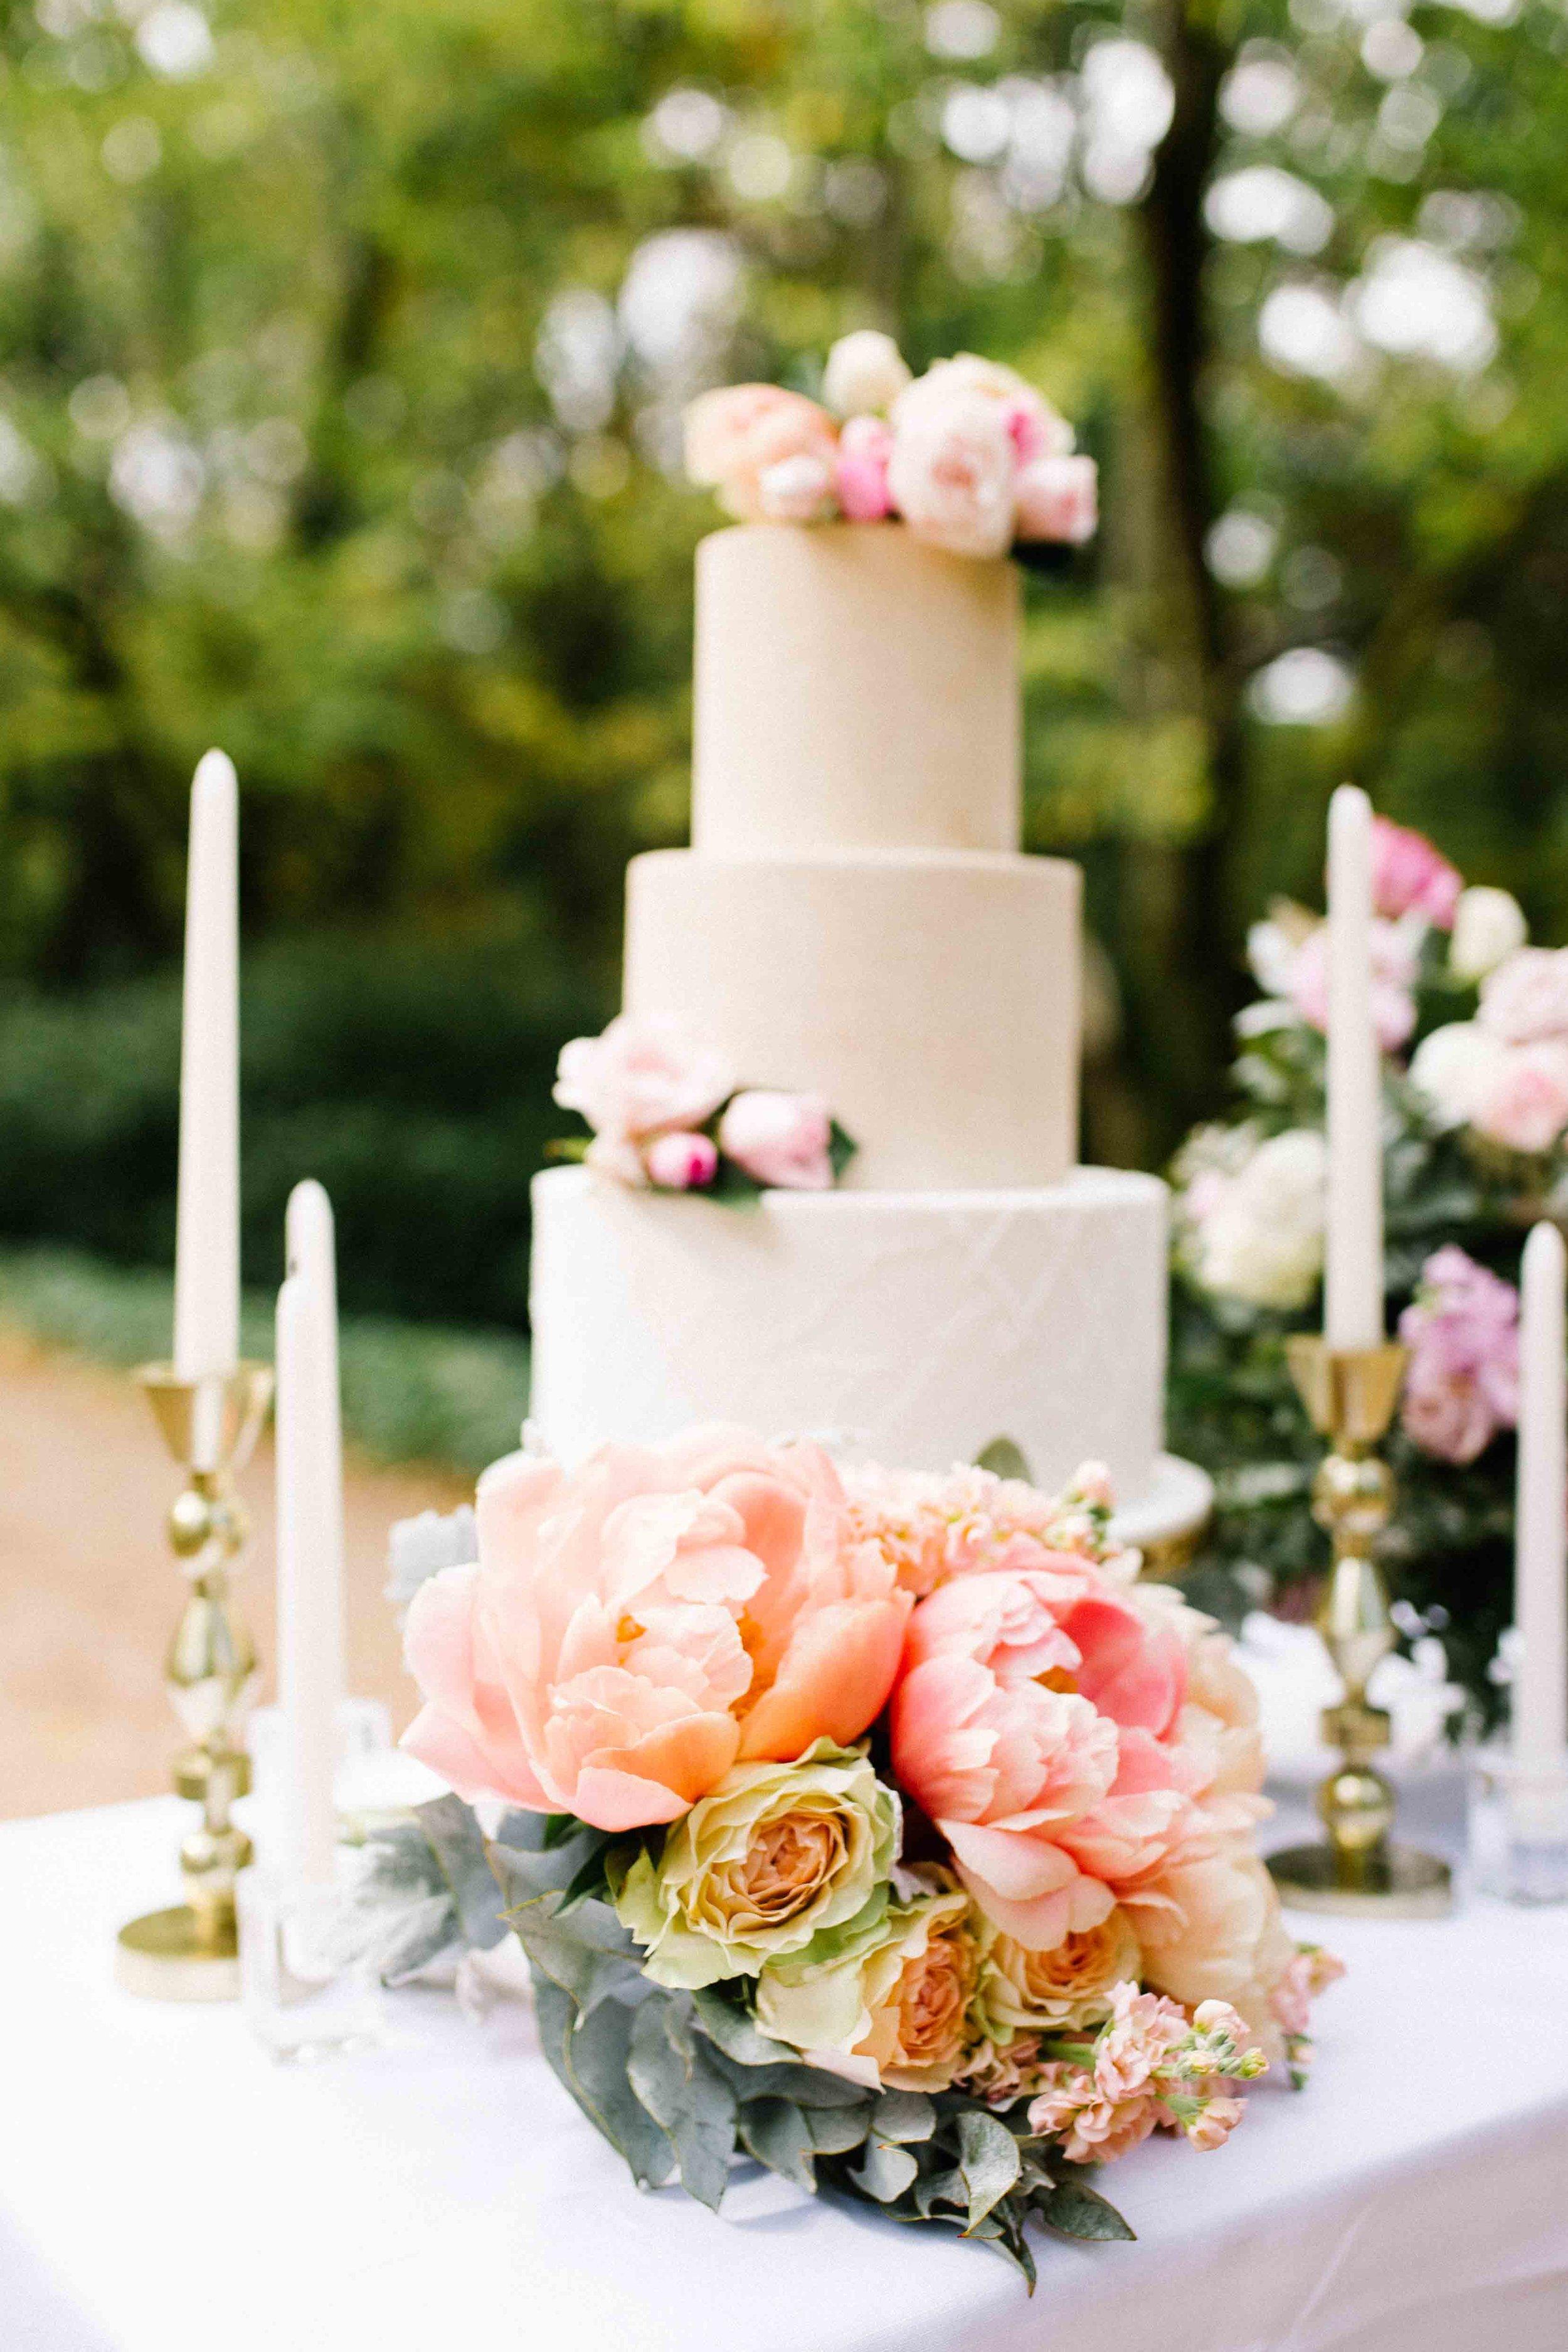 Dancing & Dessert Wedding Stylist Cake Table